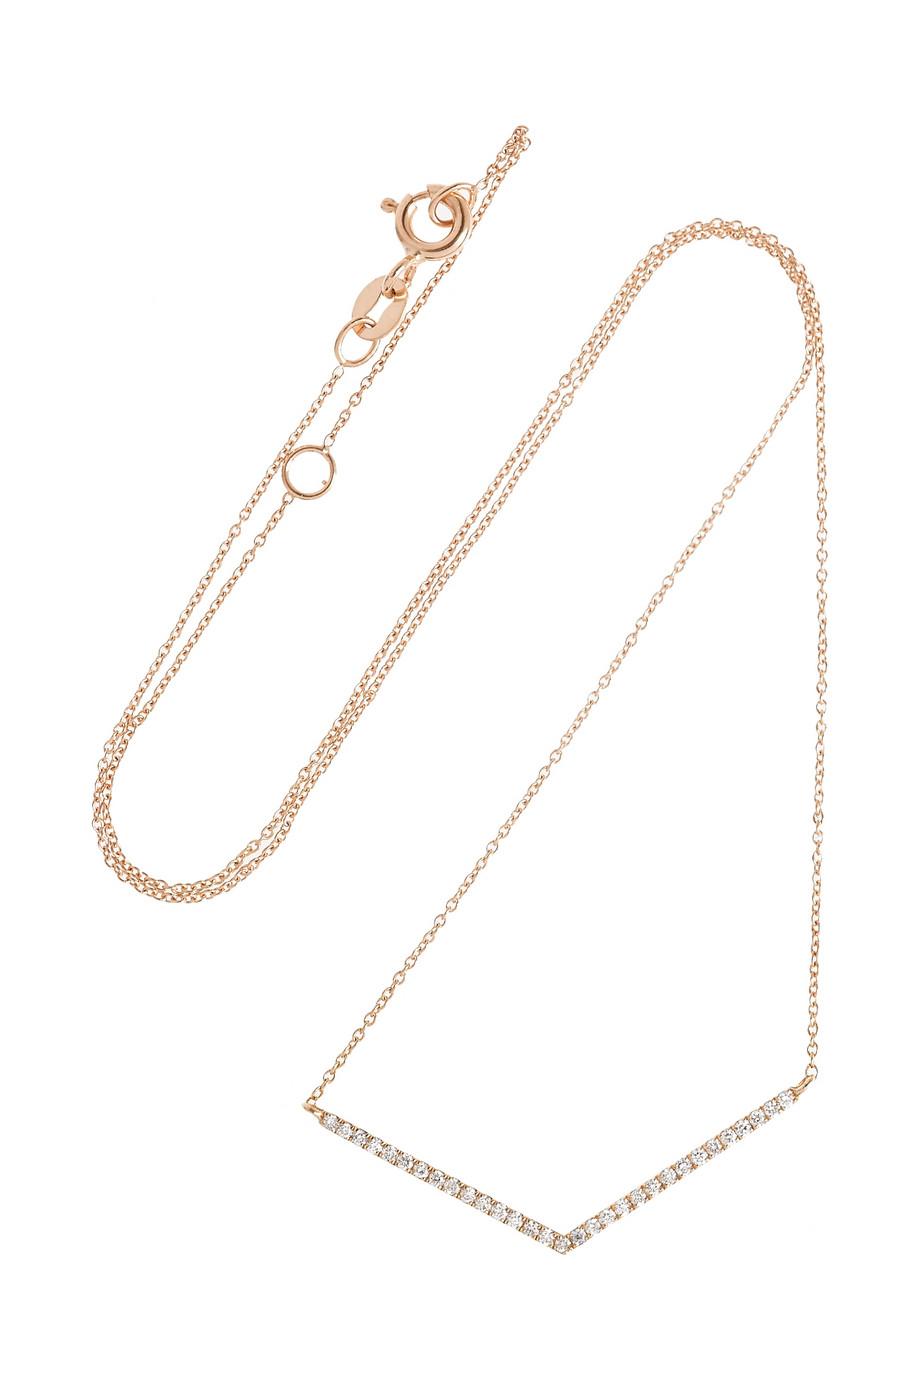 Diane Kordas Explosion Bolo Suede, 18-karat Rose Gold And Diamond Necklace